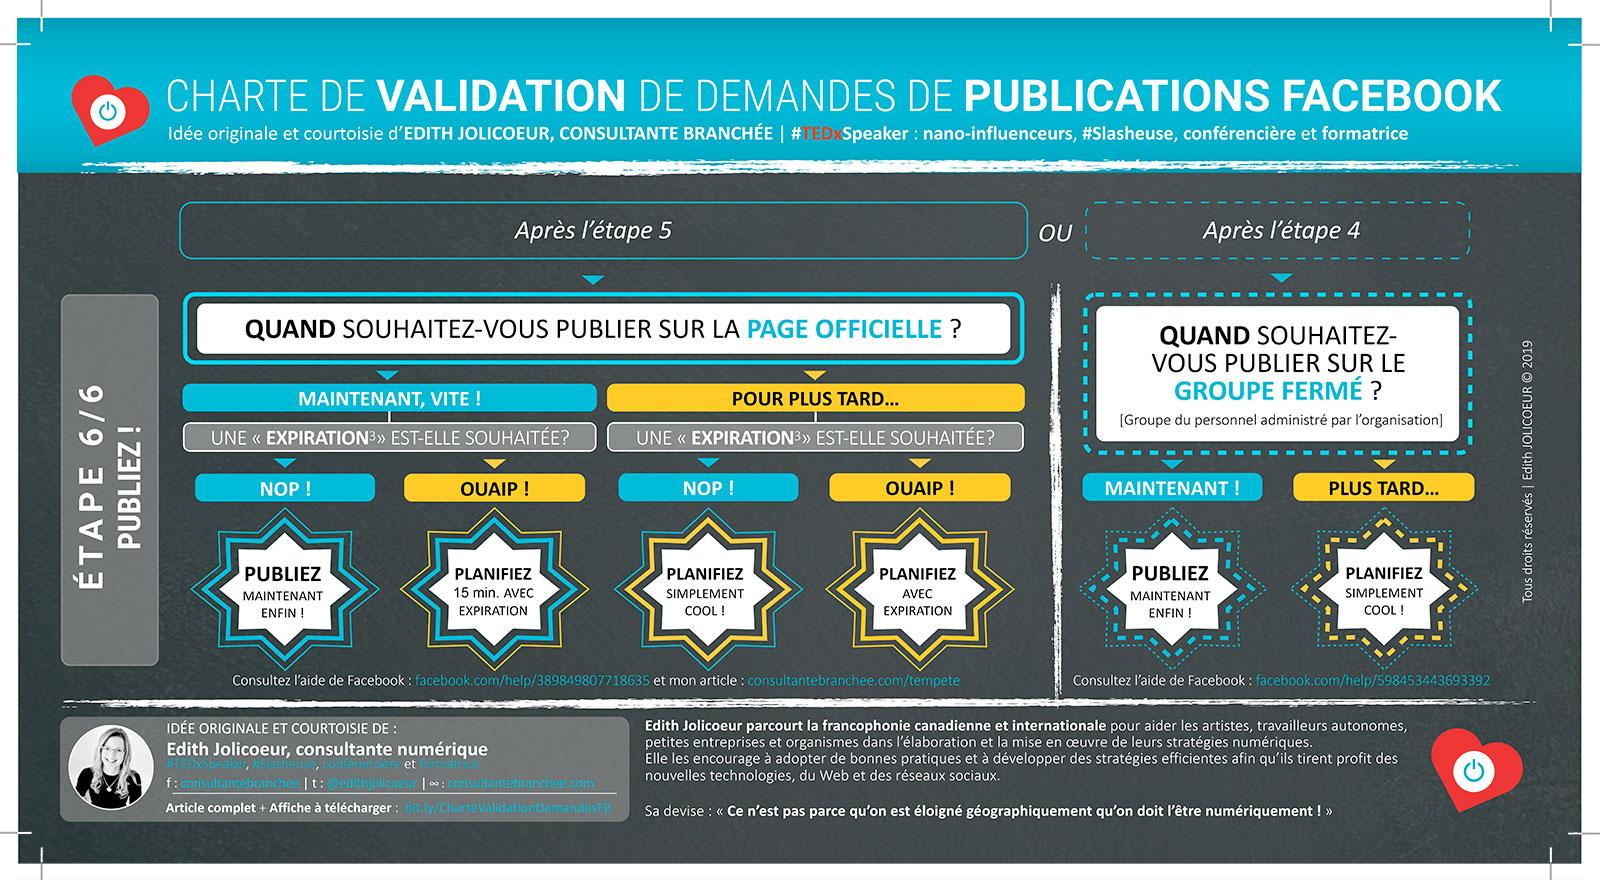 Étape 6 : CHARTE DE VALIDATION de demandes de publications Facebook | Edith JOLICOEUR, consultante branchée